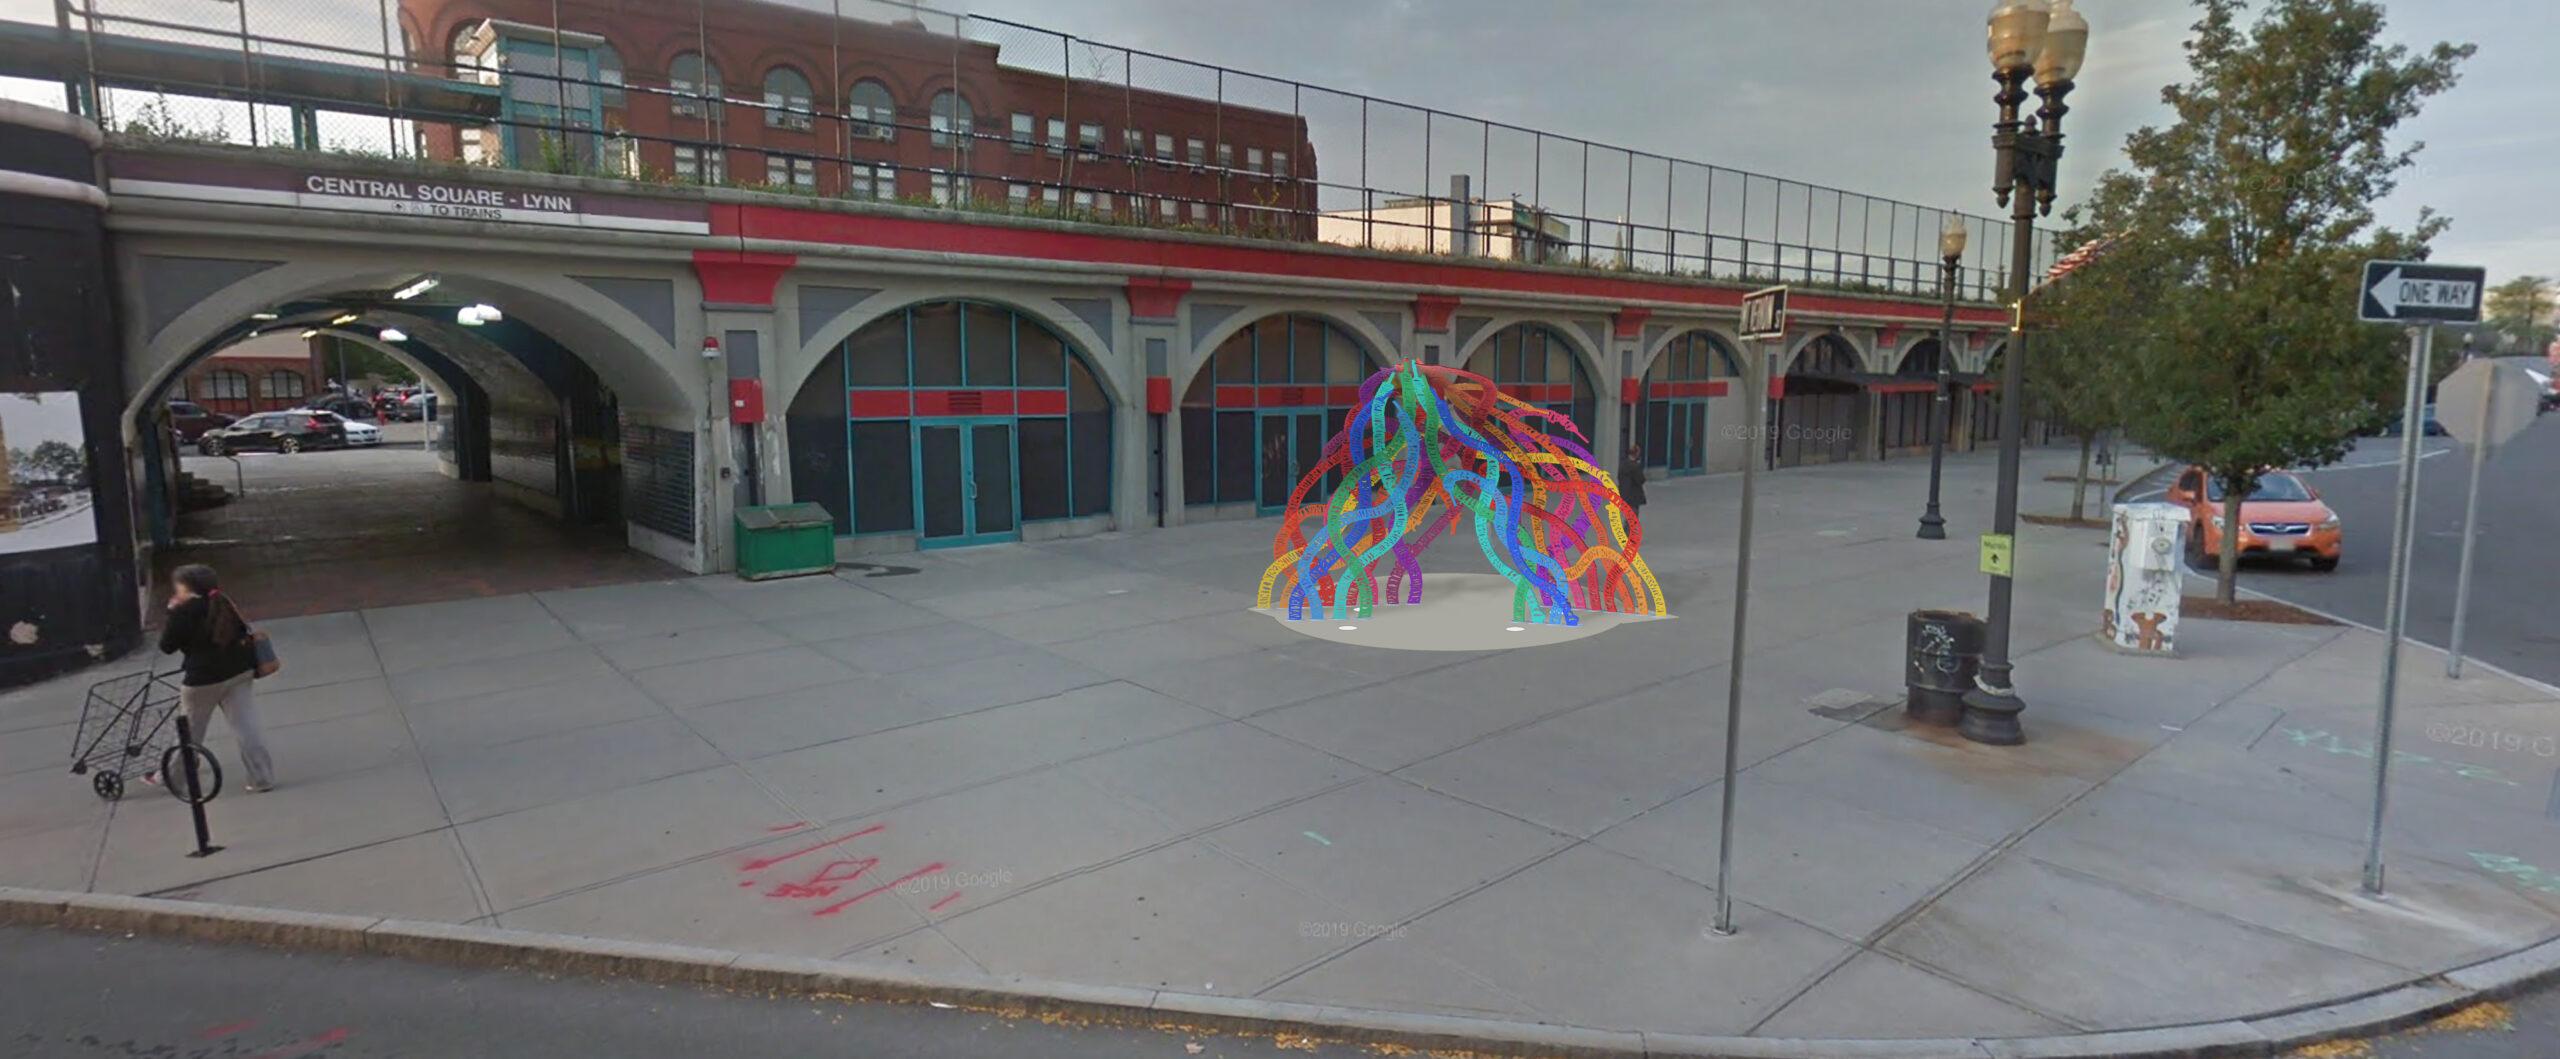 http://orloskystudio.com/wp-content/uploads/2021/10/in-plaza-1-scaled.jpg